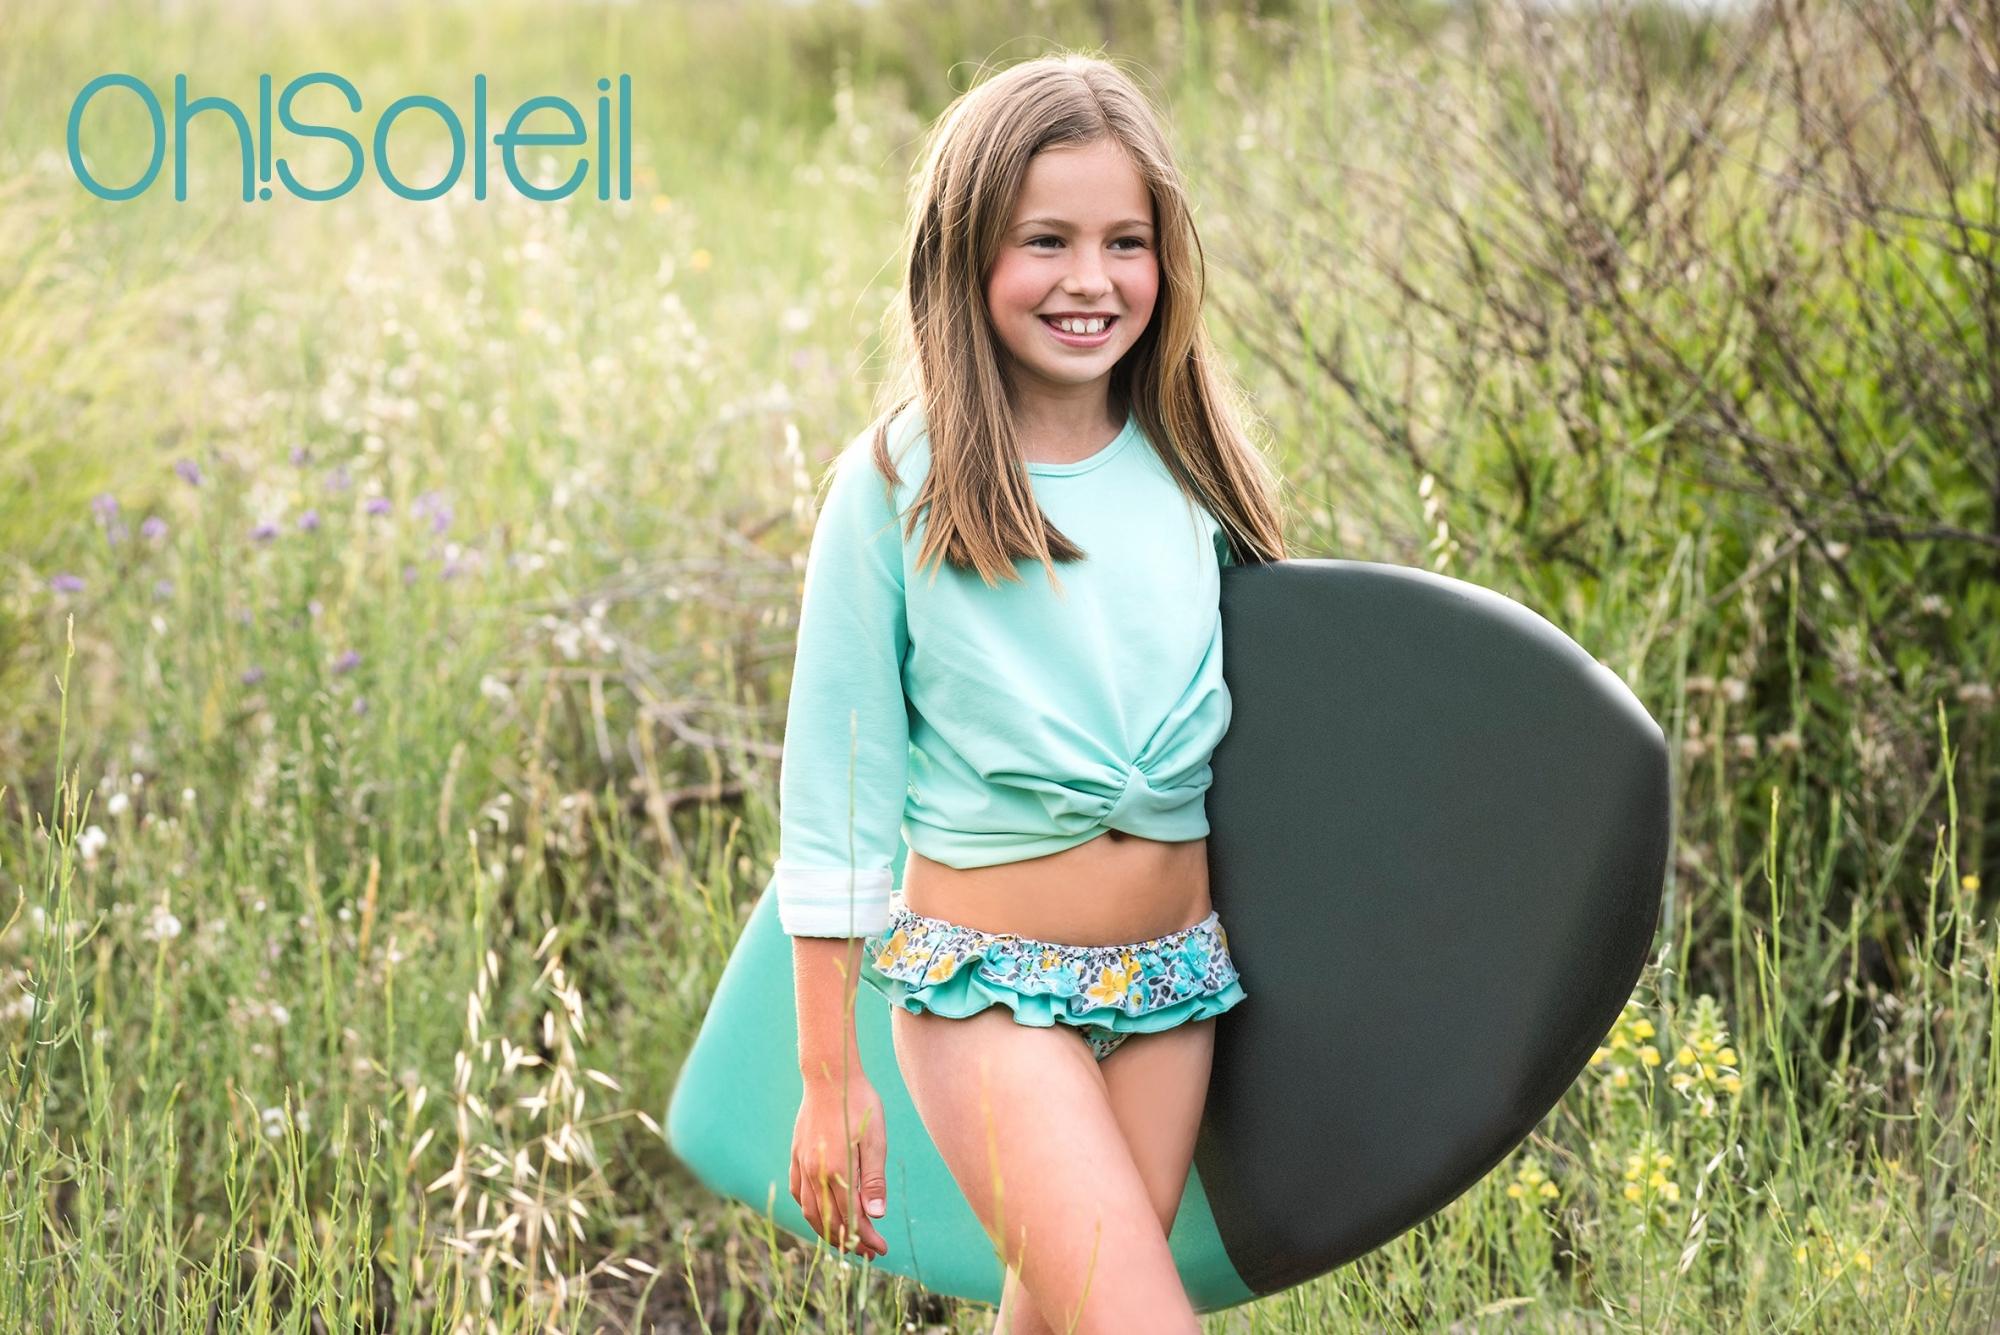 Oh Soleil